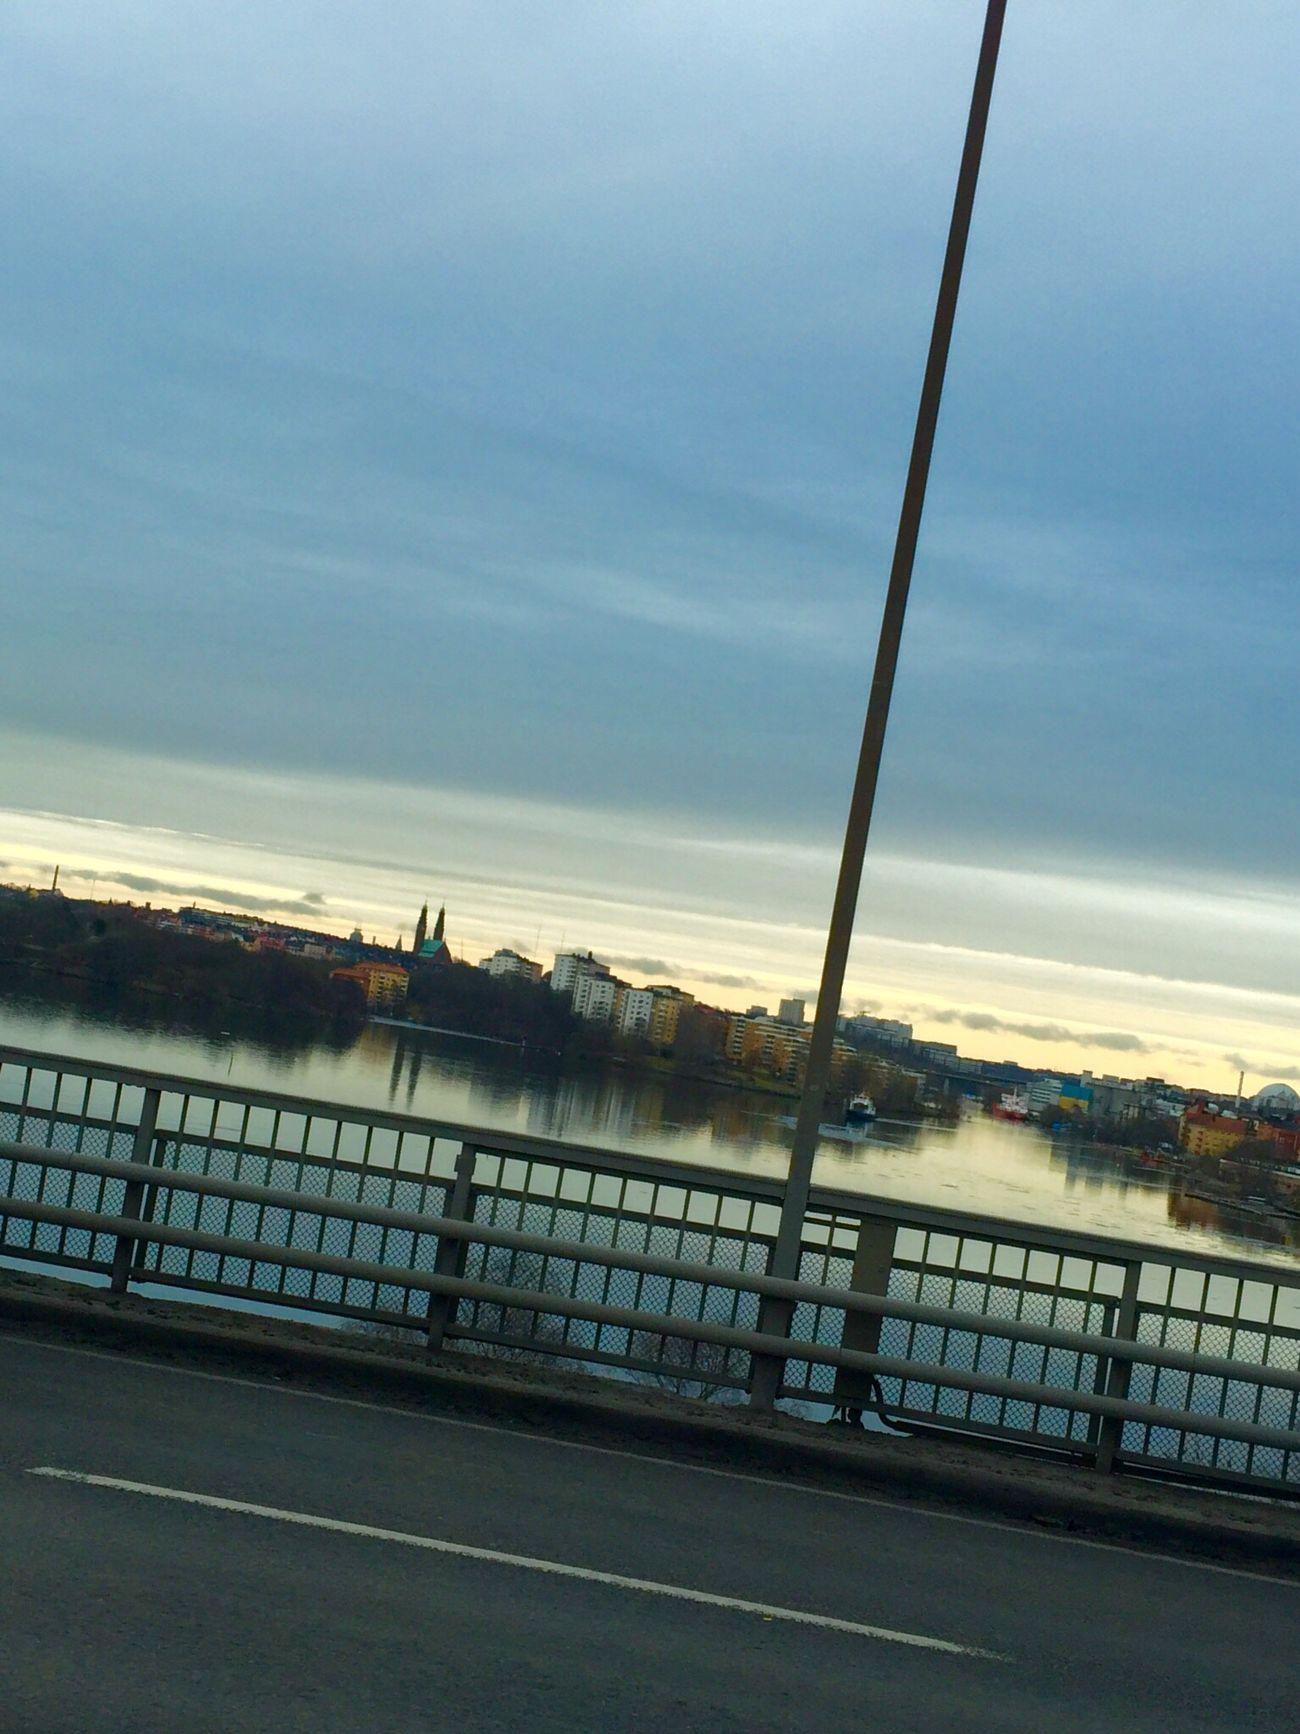 Going To Work Road Bridge